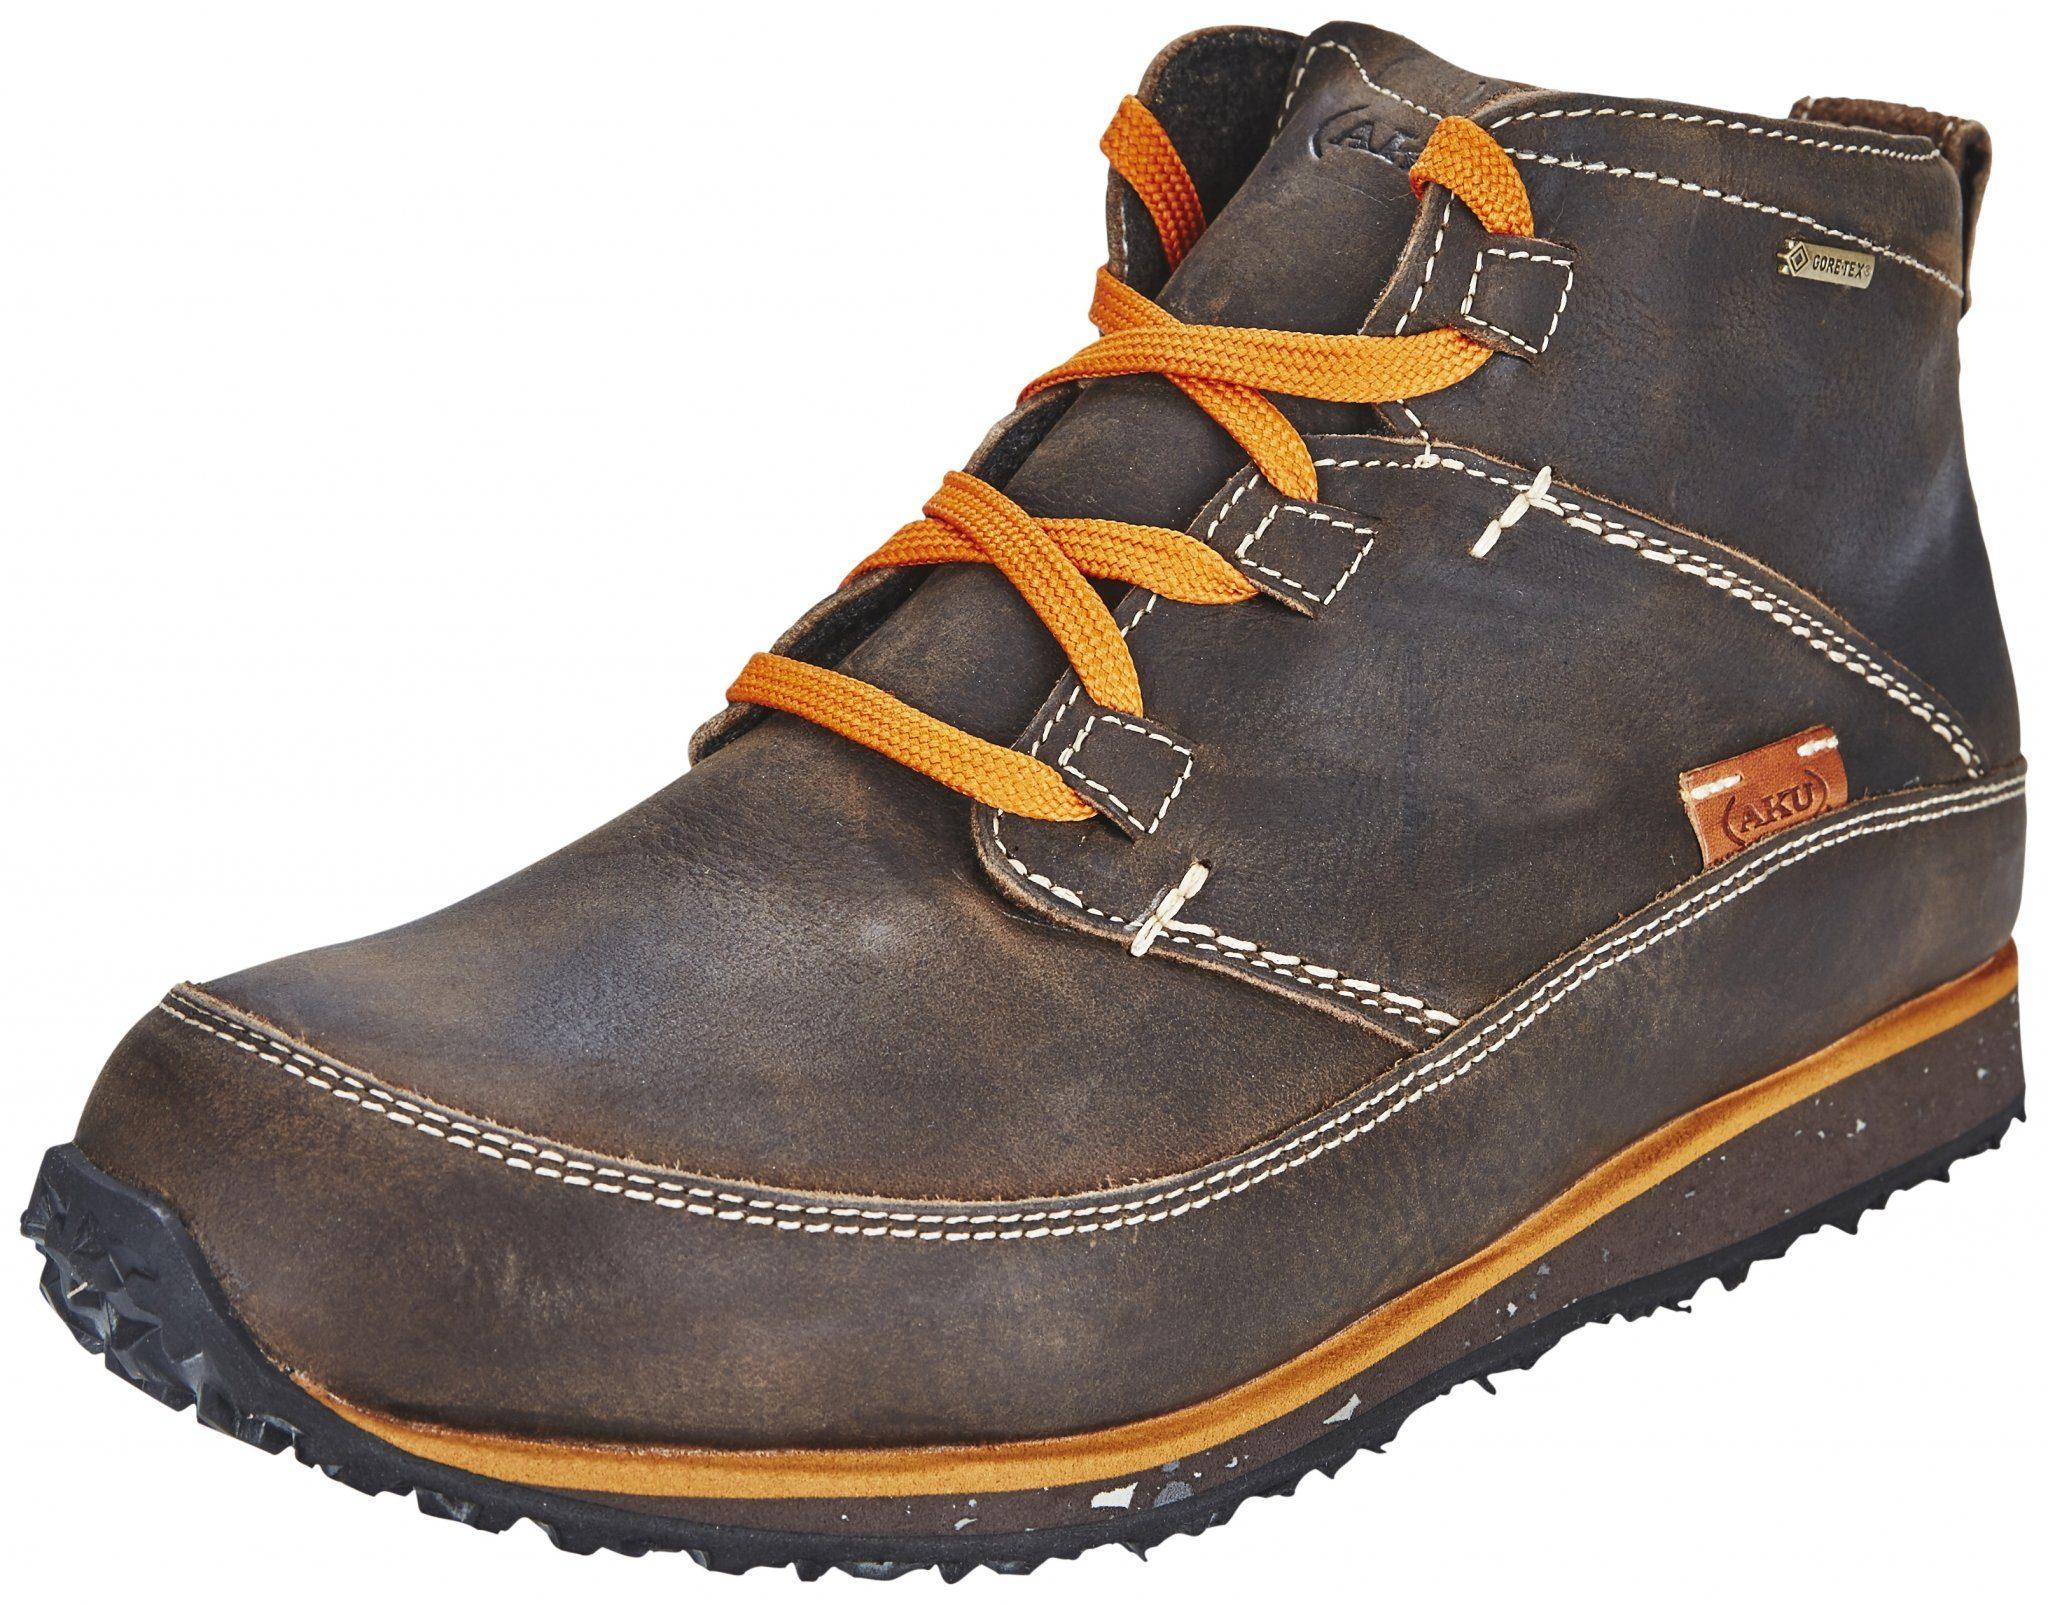 AKU Kletterschuh »Vitalpina II GTX Shoes Unisex«